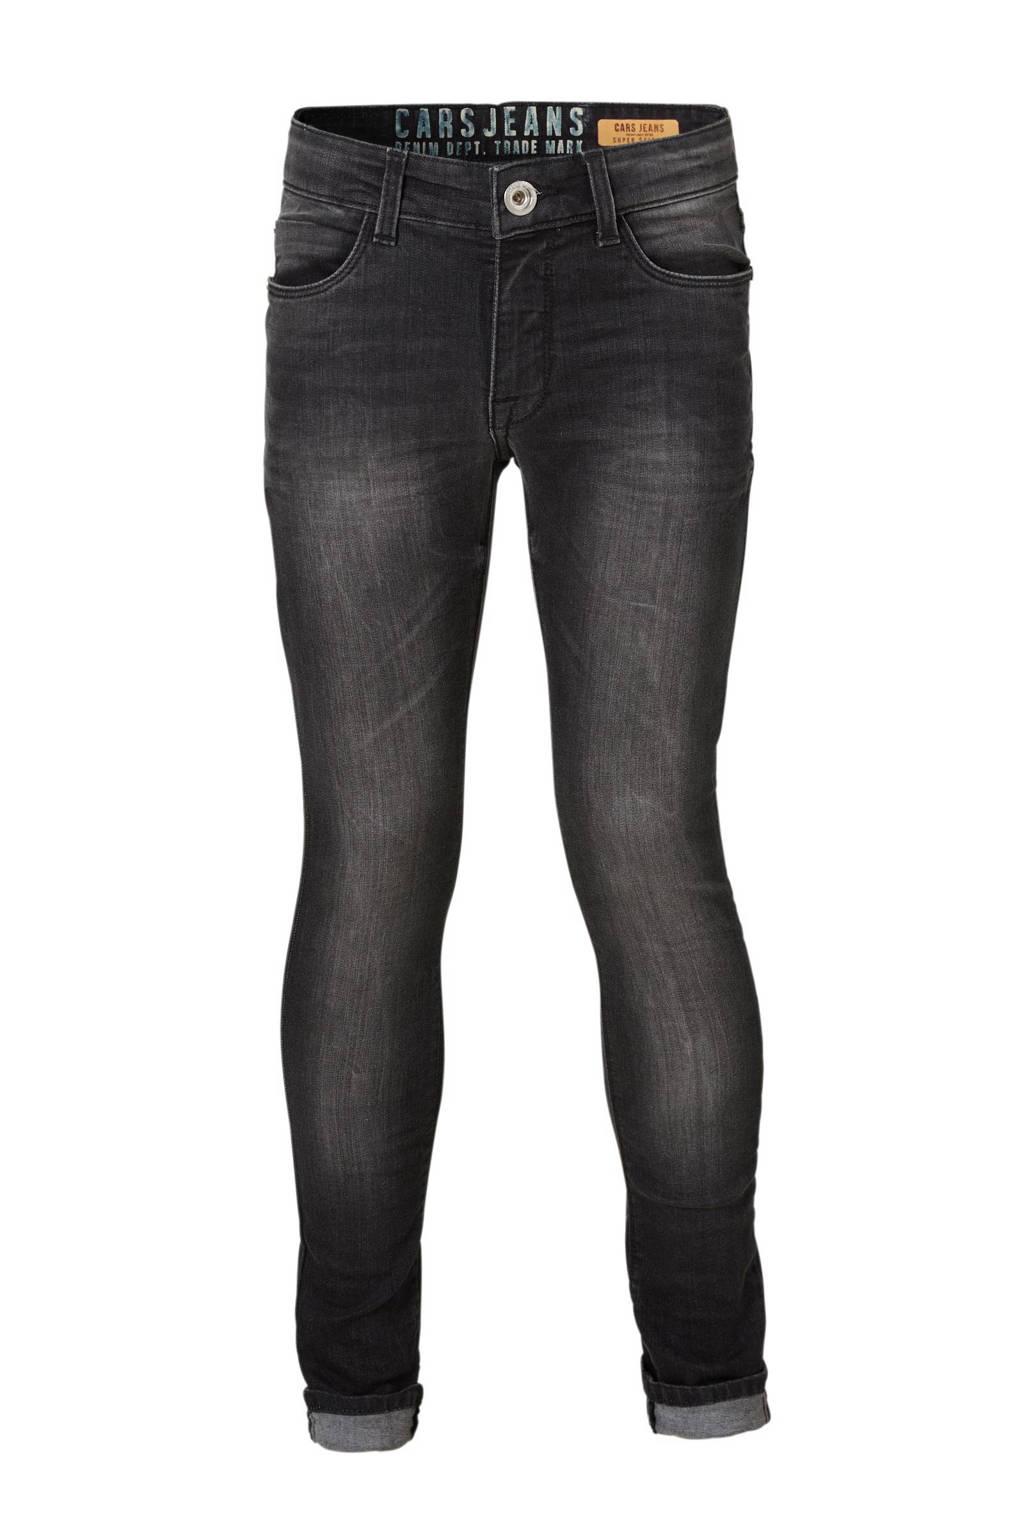 Cars skinny jeans Hondall, Grijs